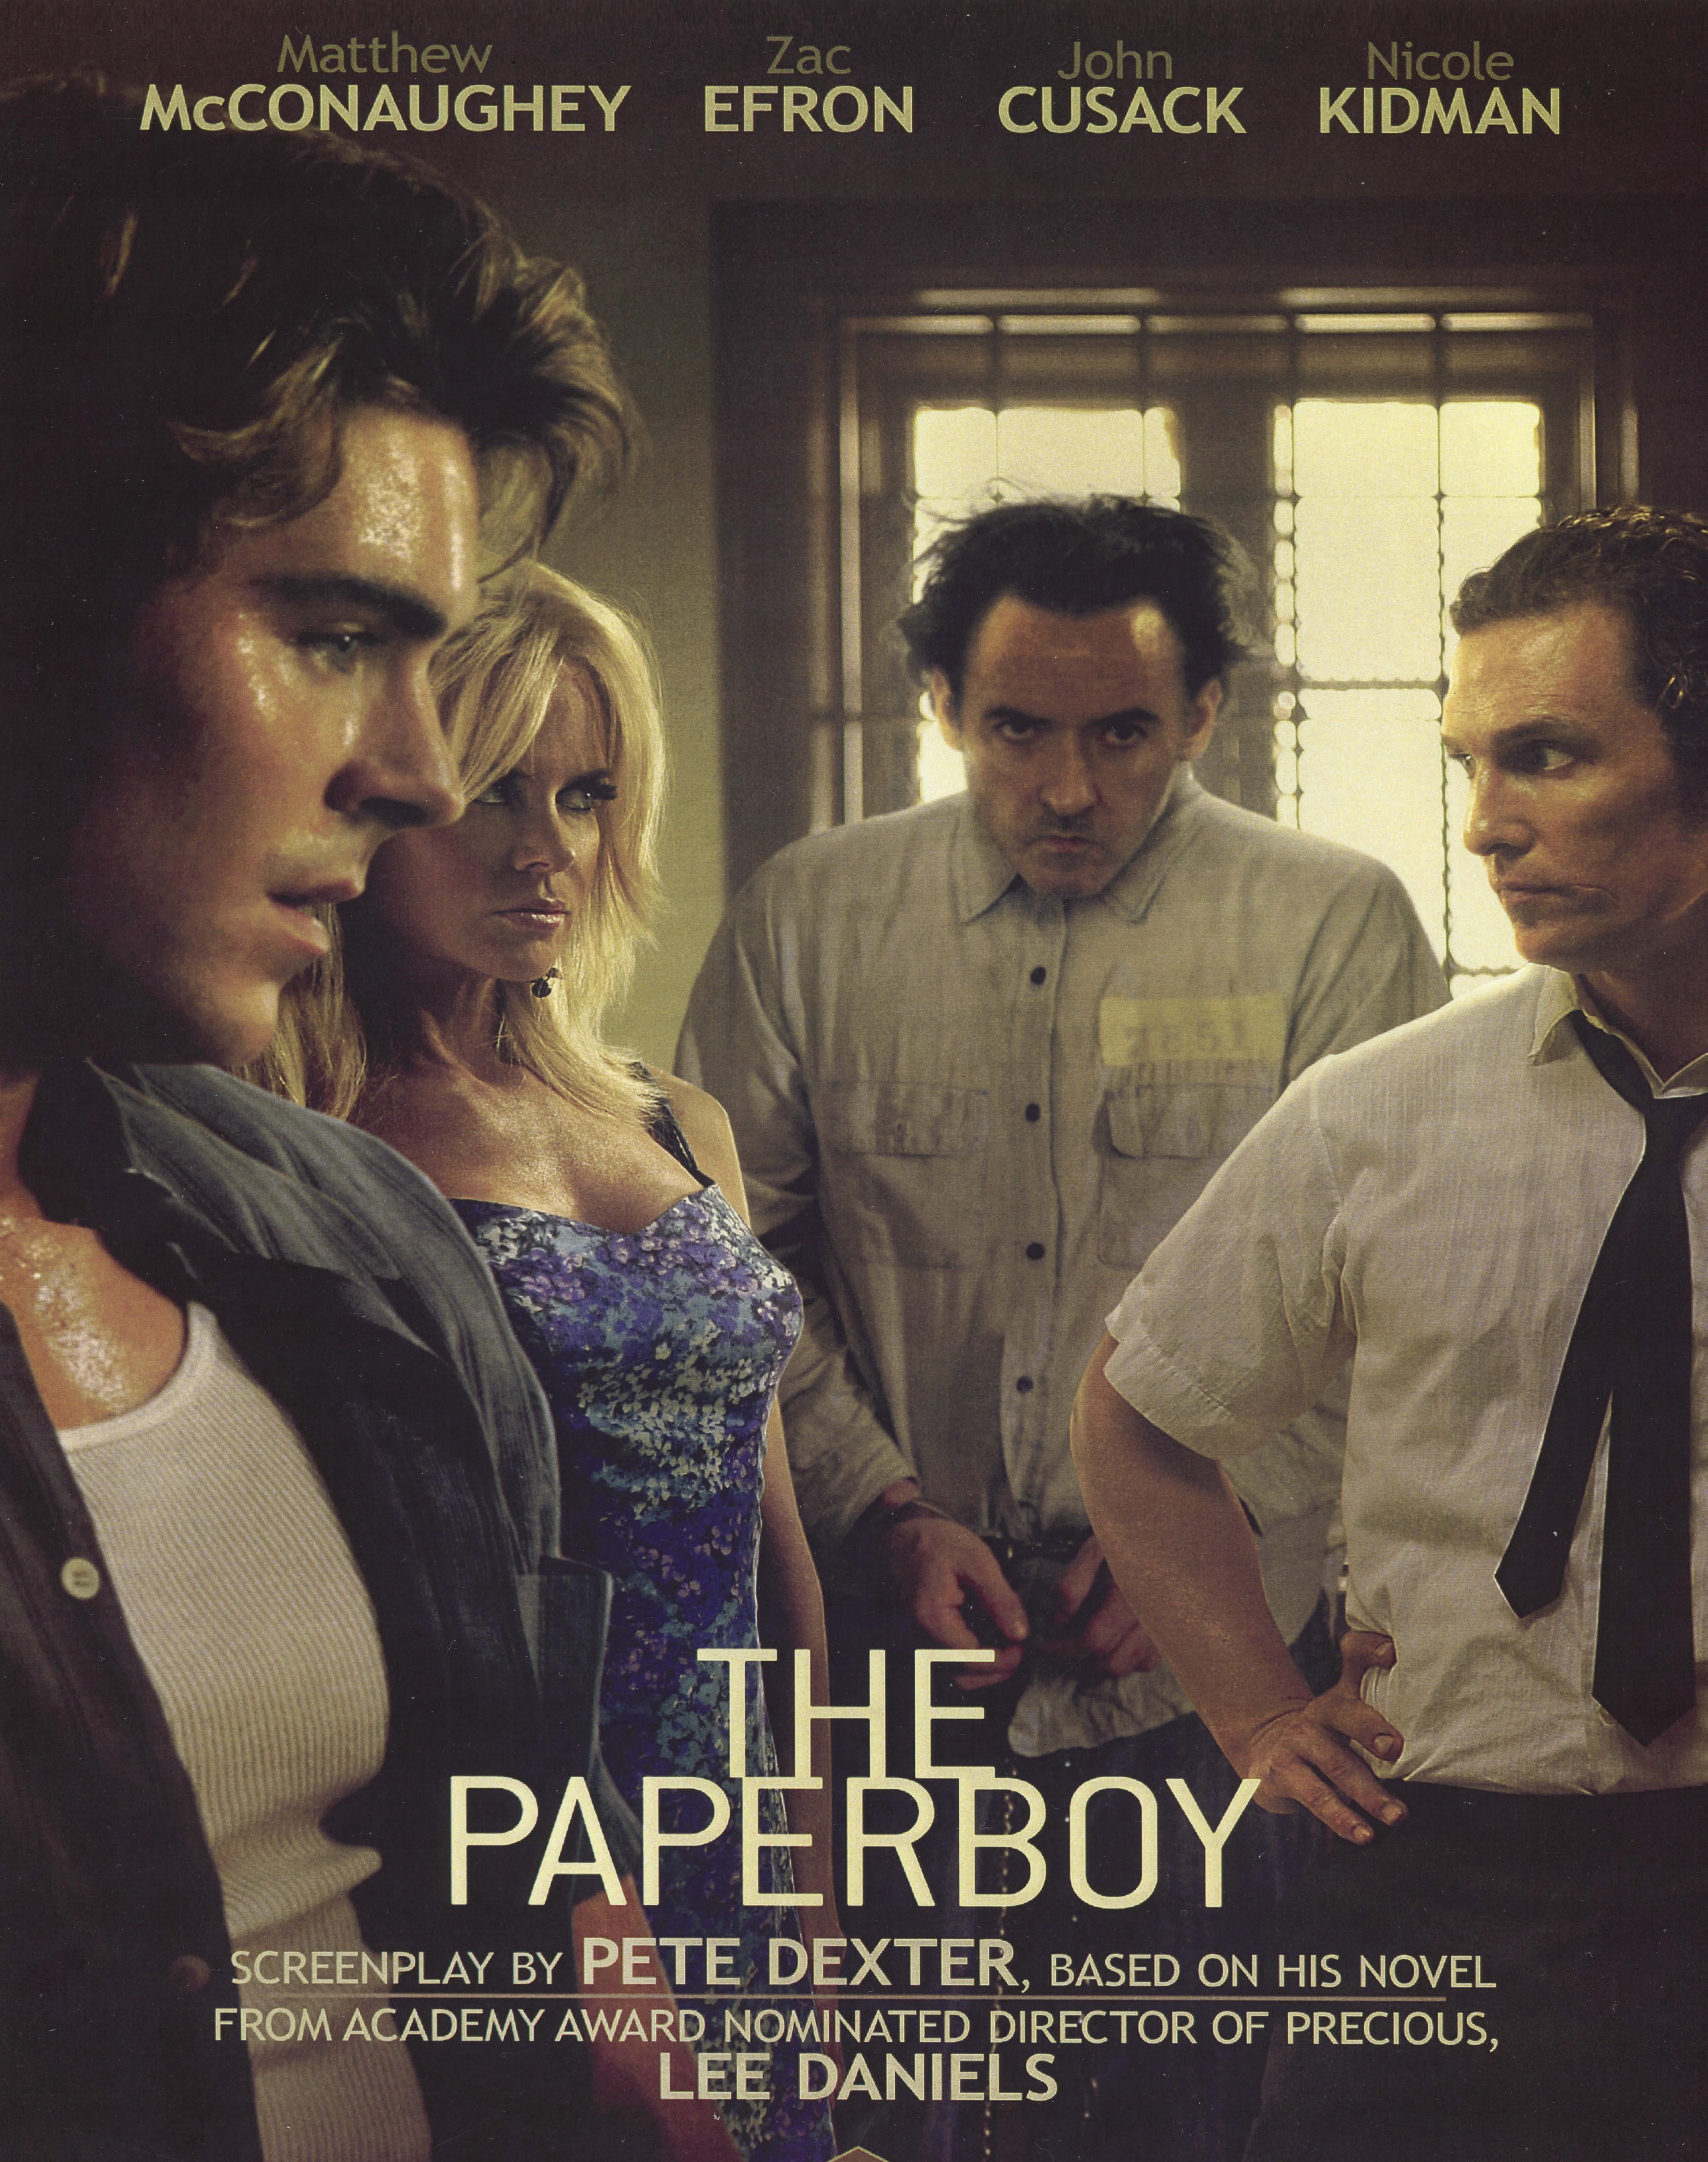 Zac Efron, Nicole Kidman, John Cusack, Matthew McConaughey, The Paperboy